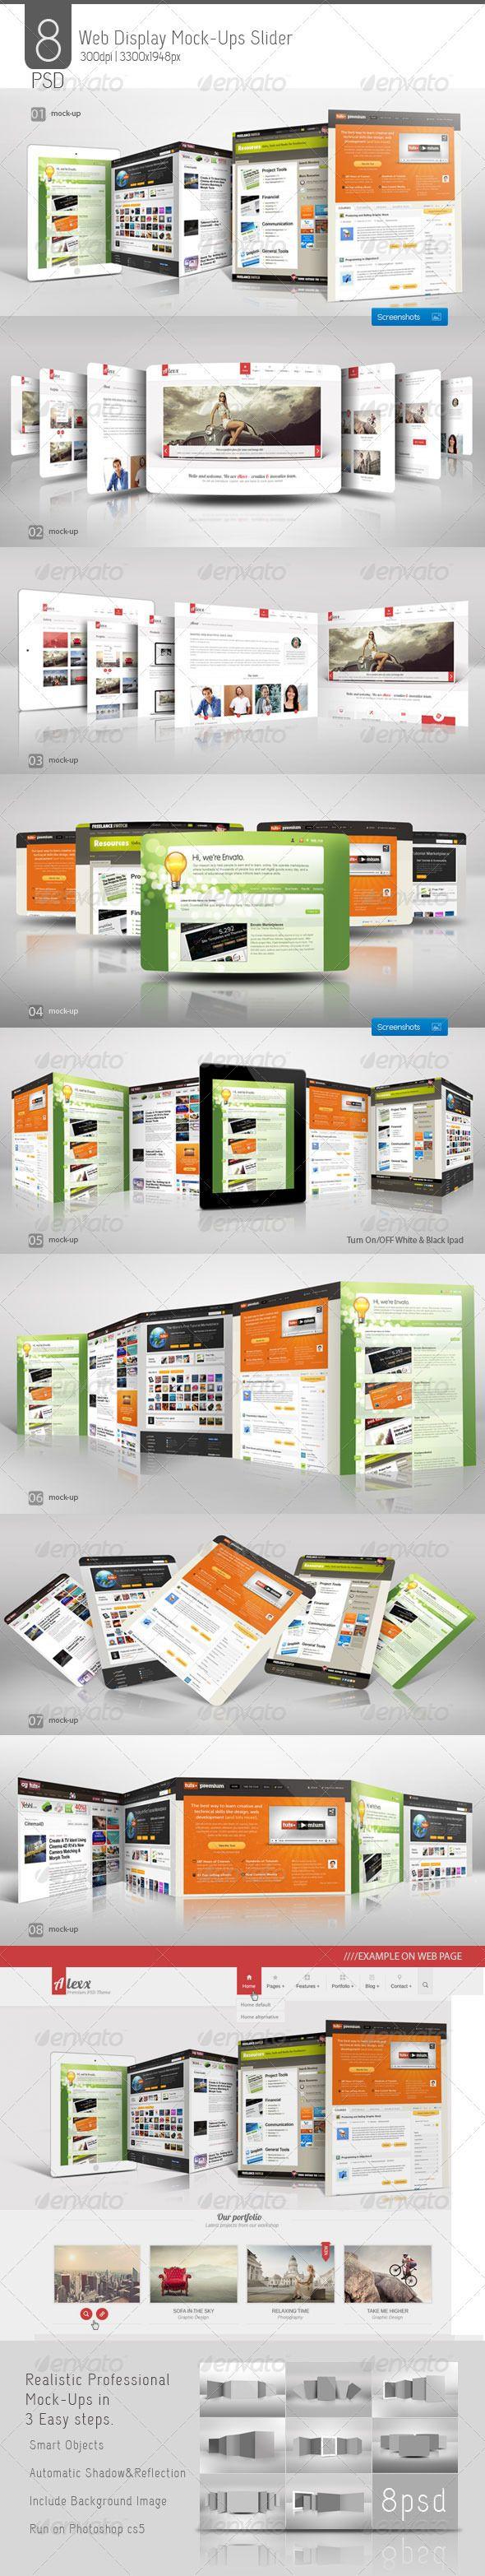 Web Display Mock-Ups Slider